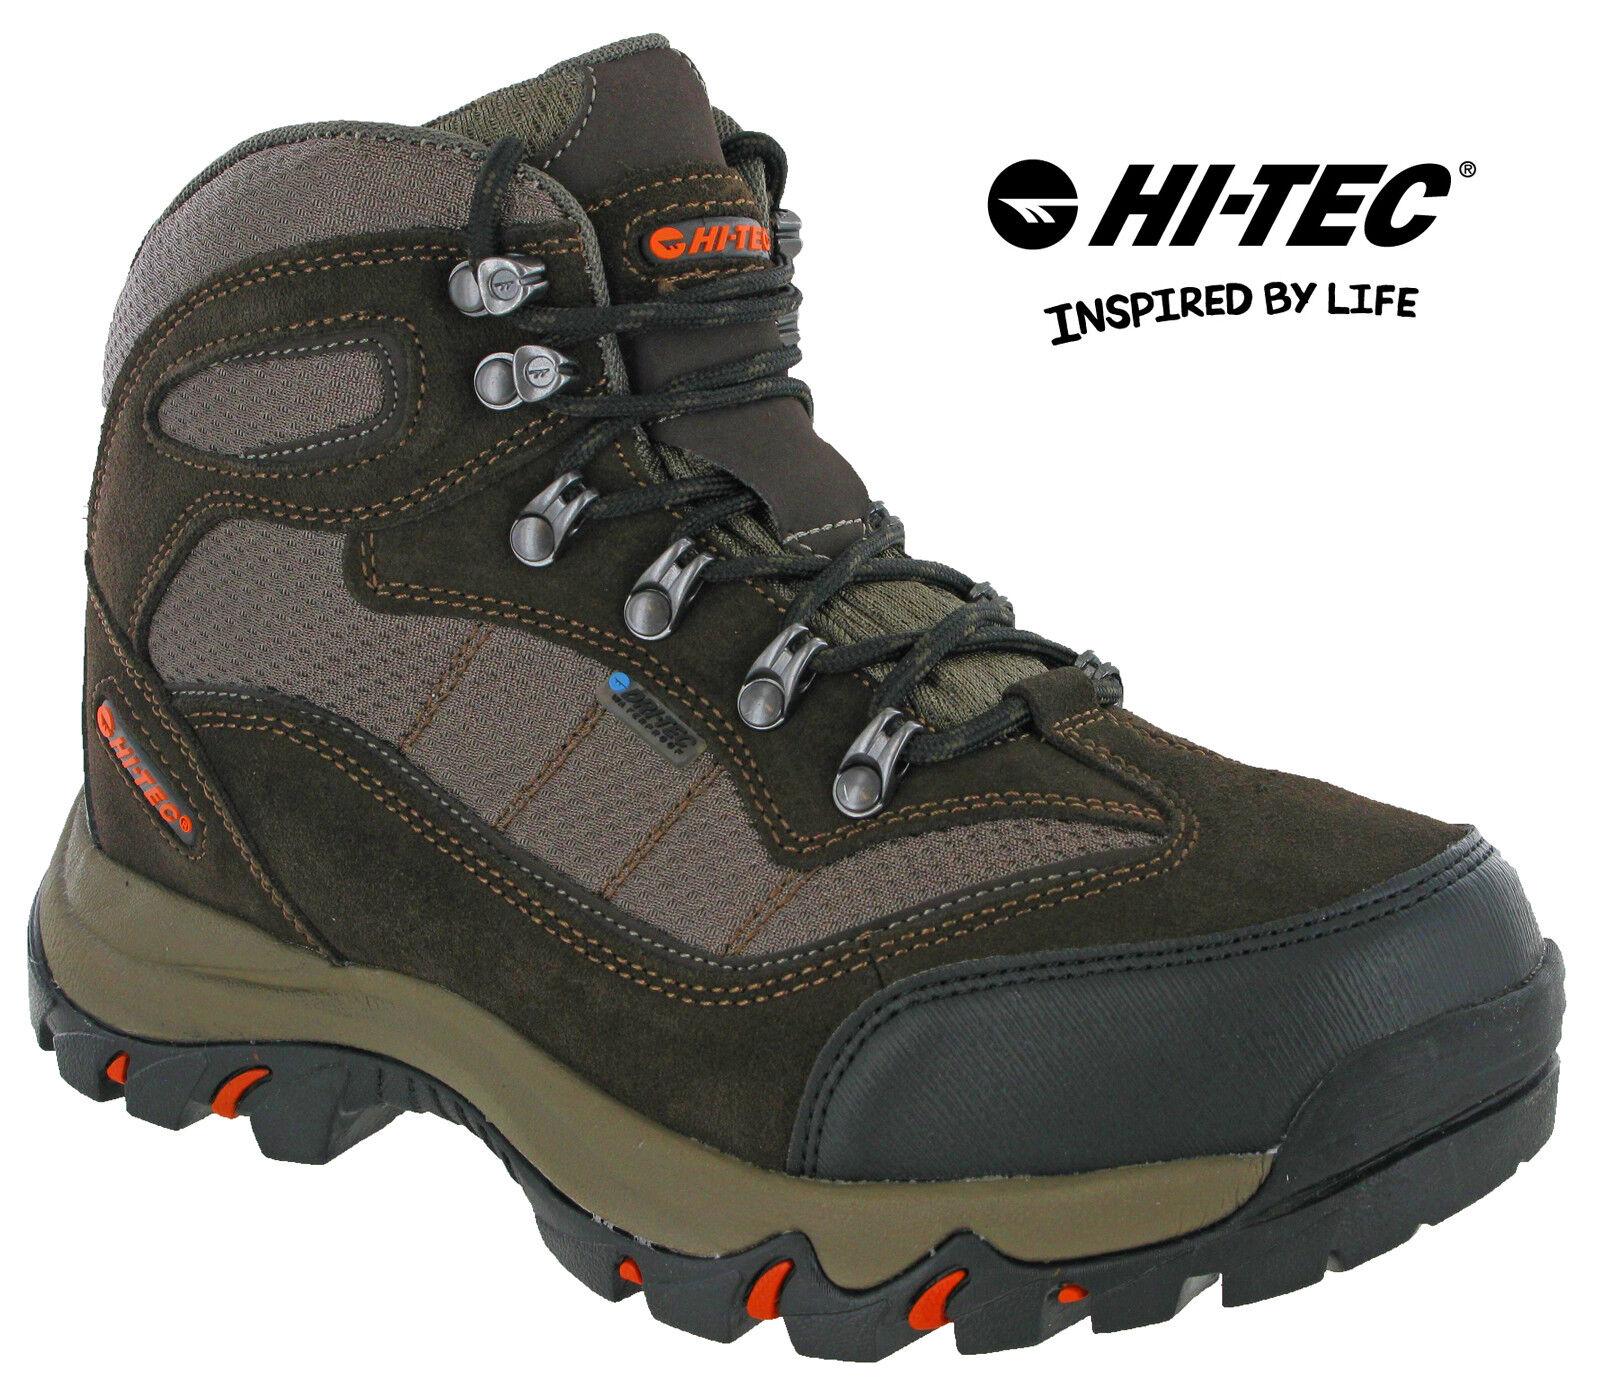 Hi-Tec Hiking Waterproof  Boots Skamania Mesh Walking Trail Lace Mens  best offer